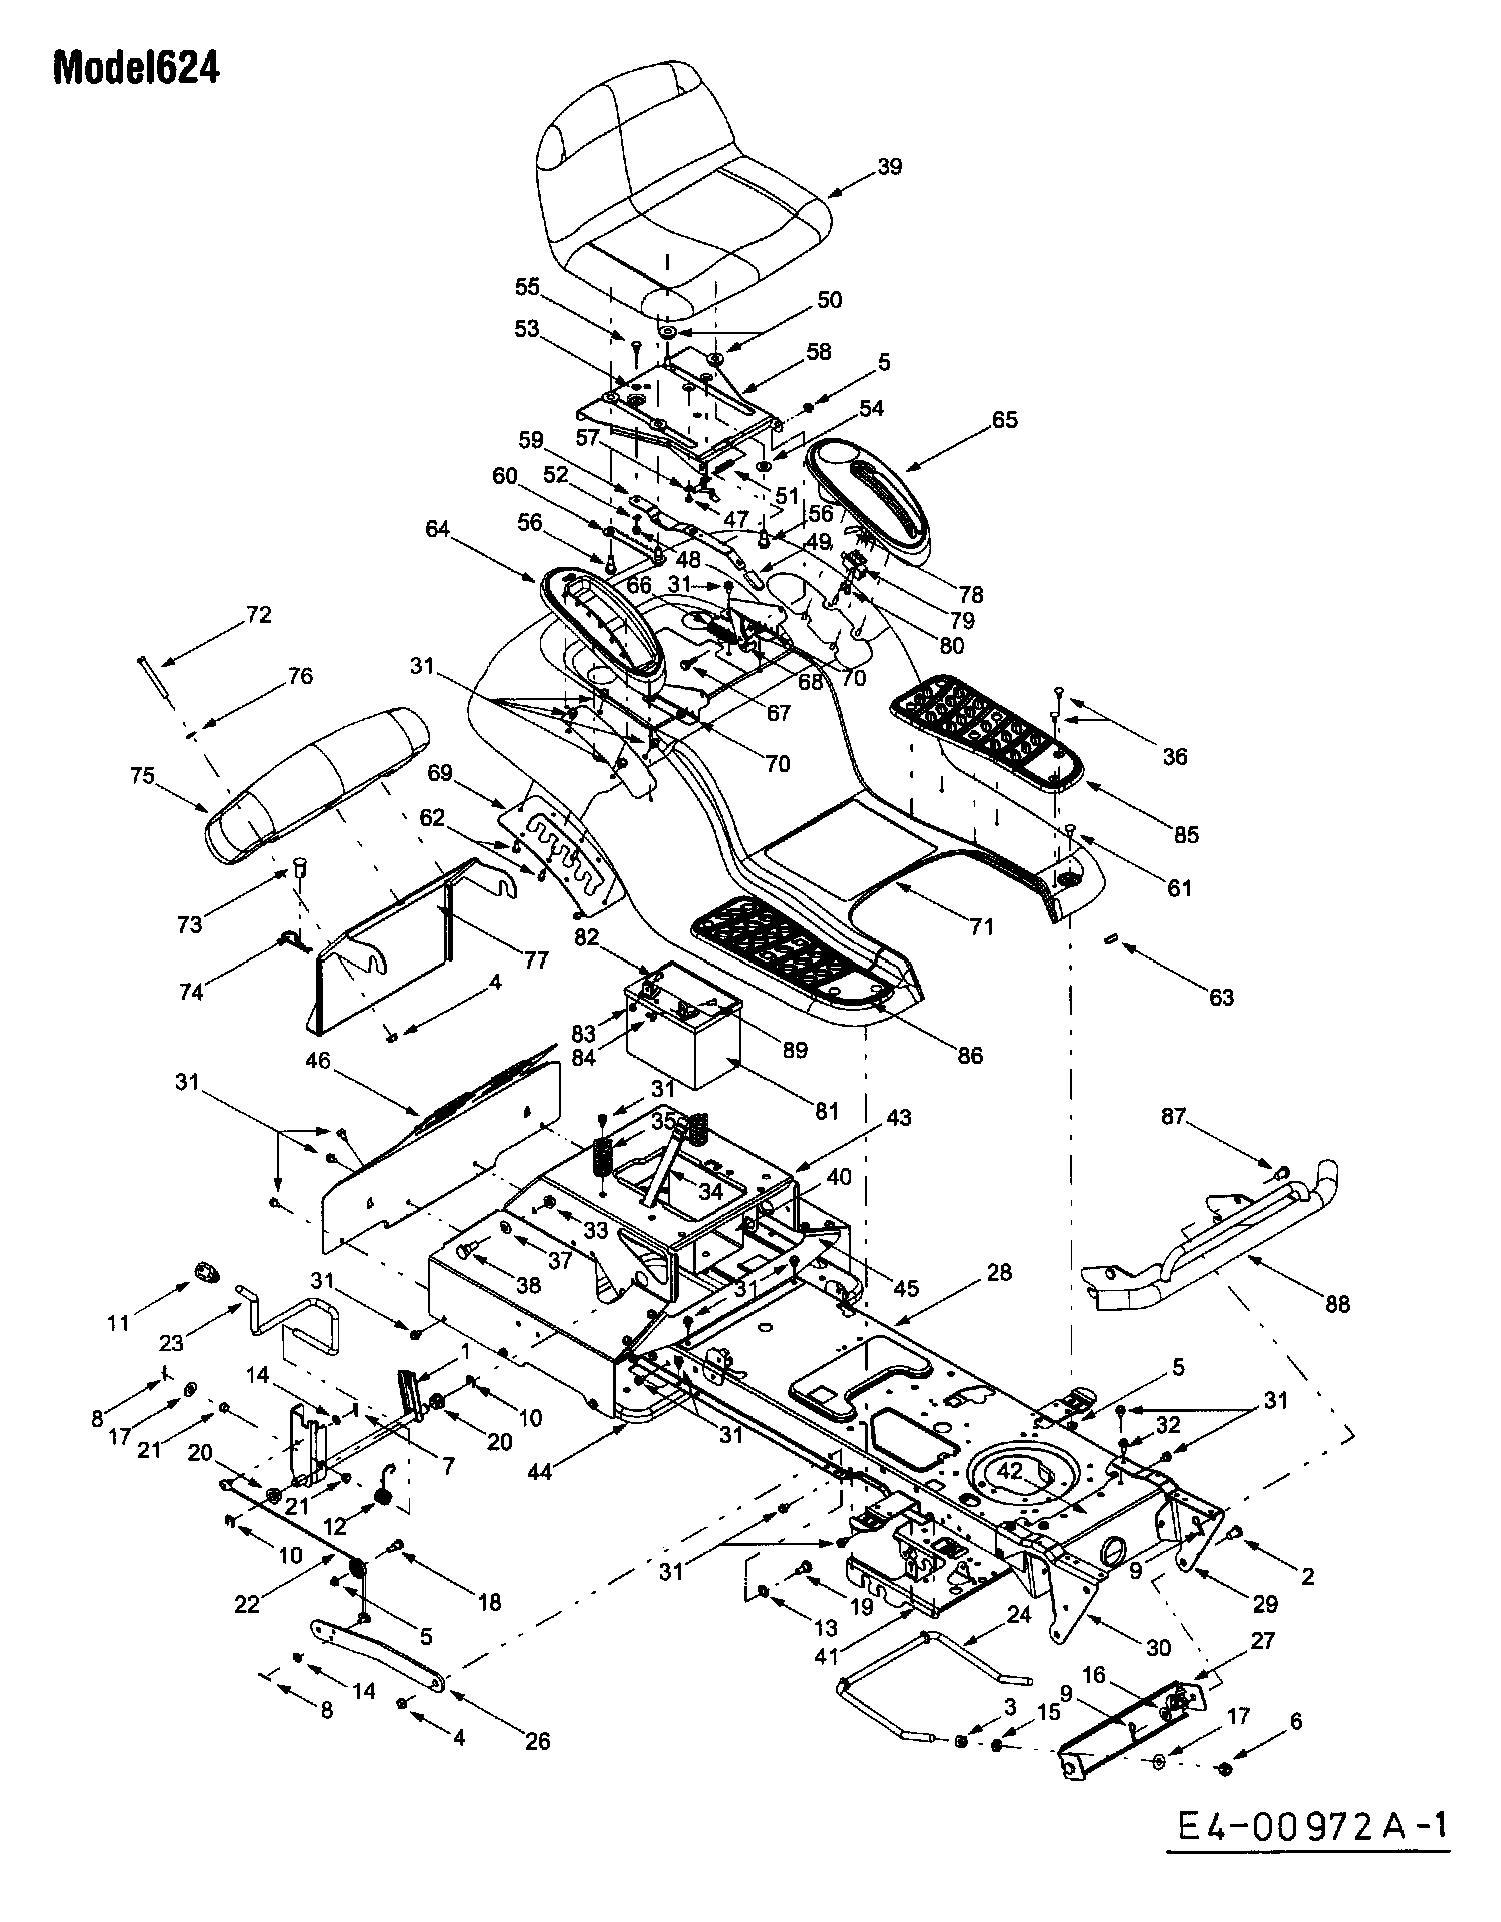 hight resolution of nissan 280zx wiring diagram imageresizertool com datsun 280zx engine diagram 240sx wiring diagram